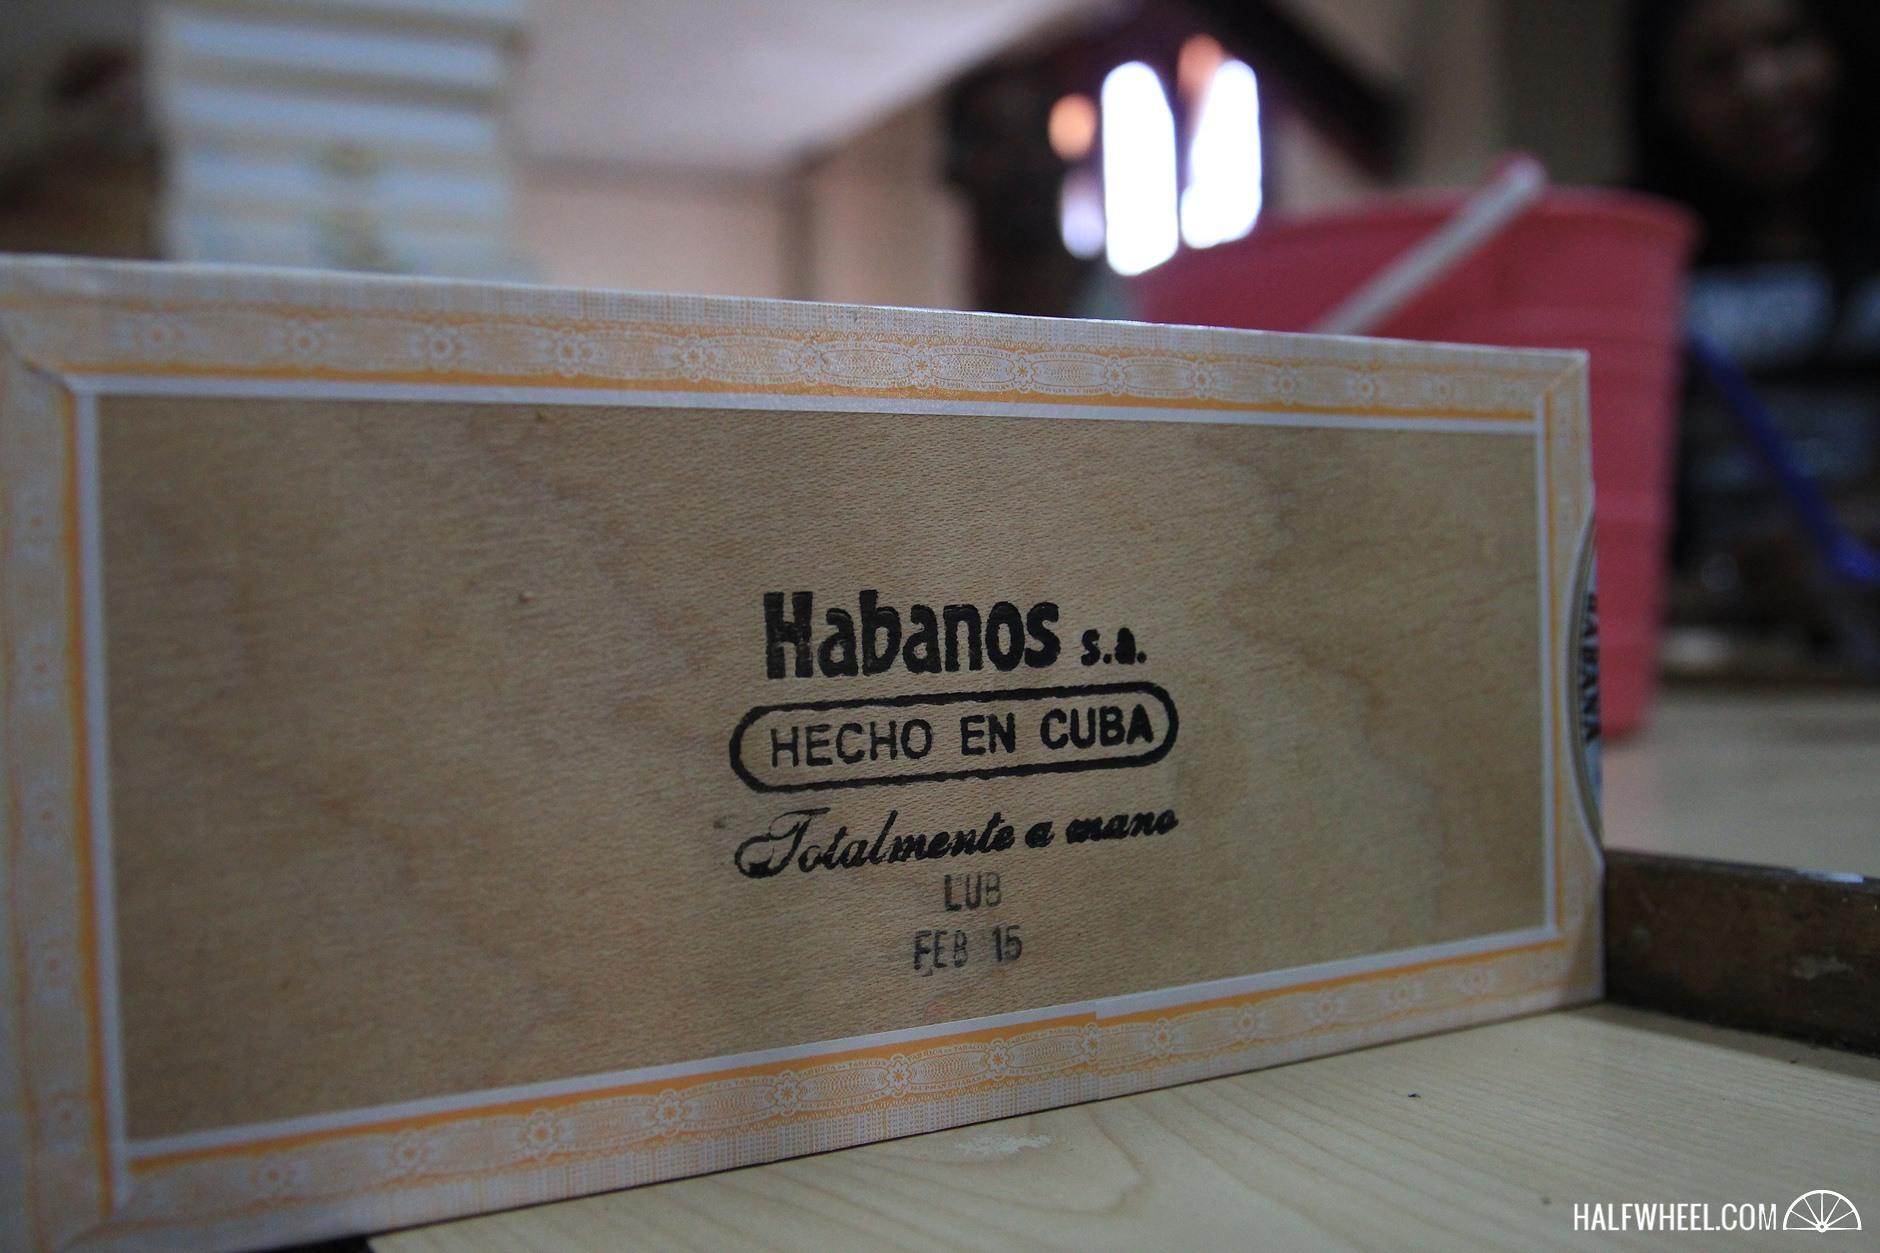 Habanos-Festival-2015-Day-4-H-Upmann-Feb-15-box.jpg